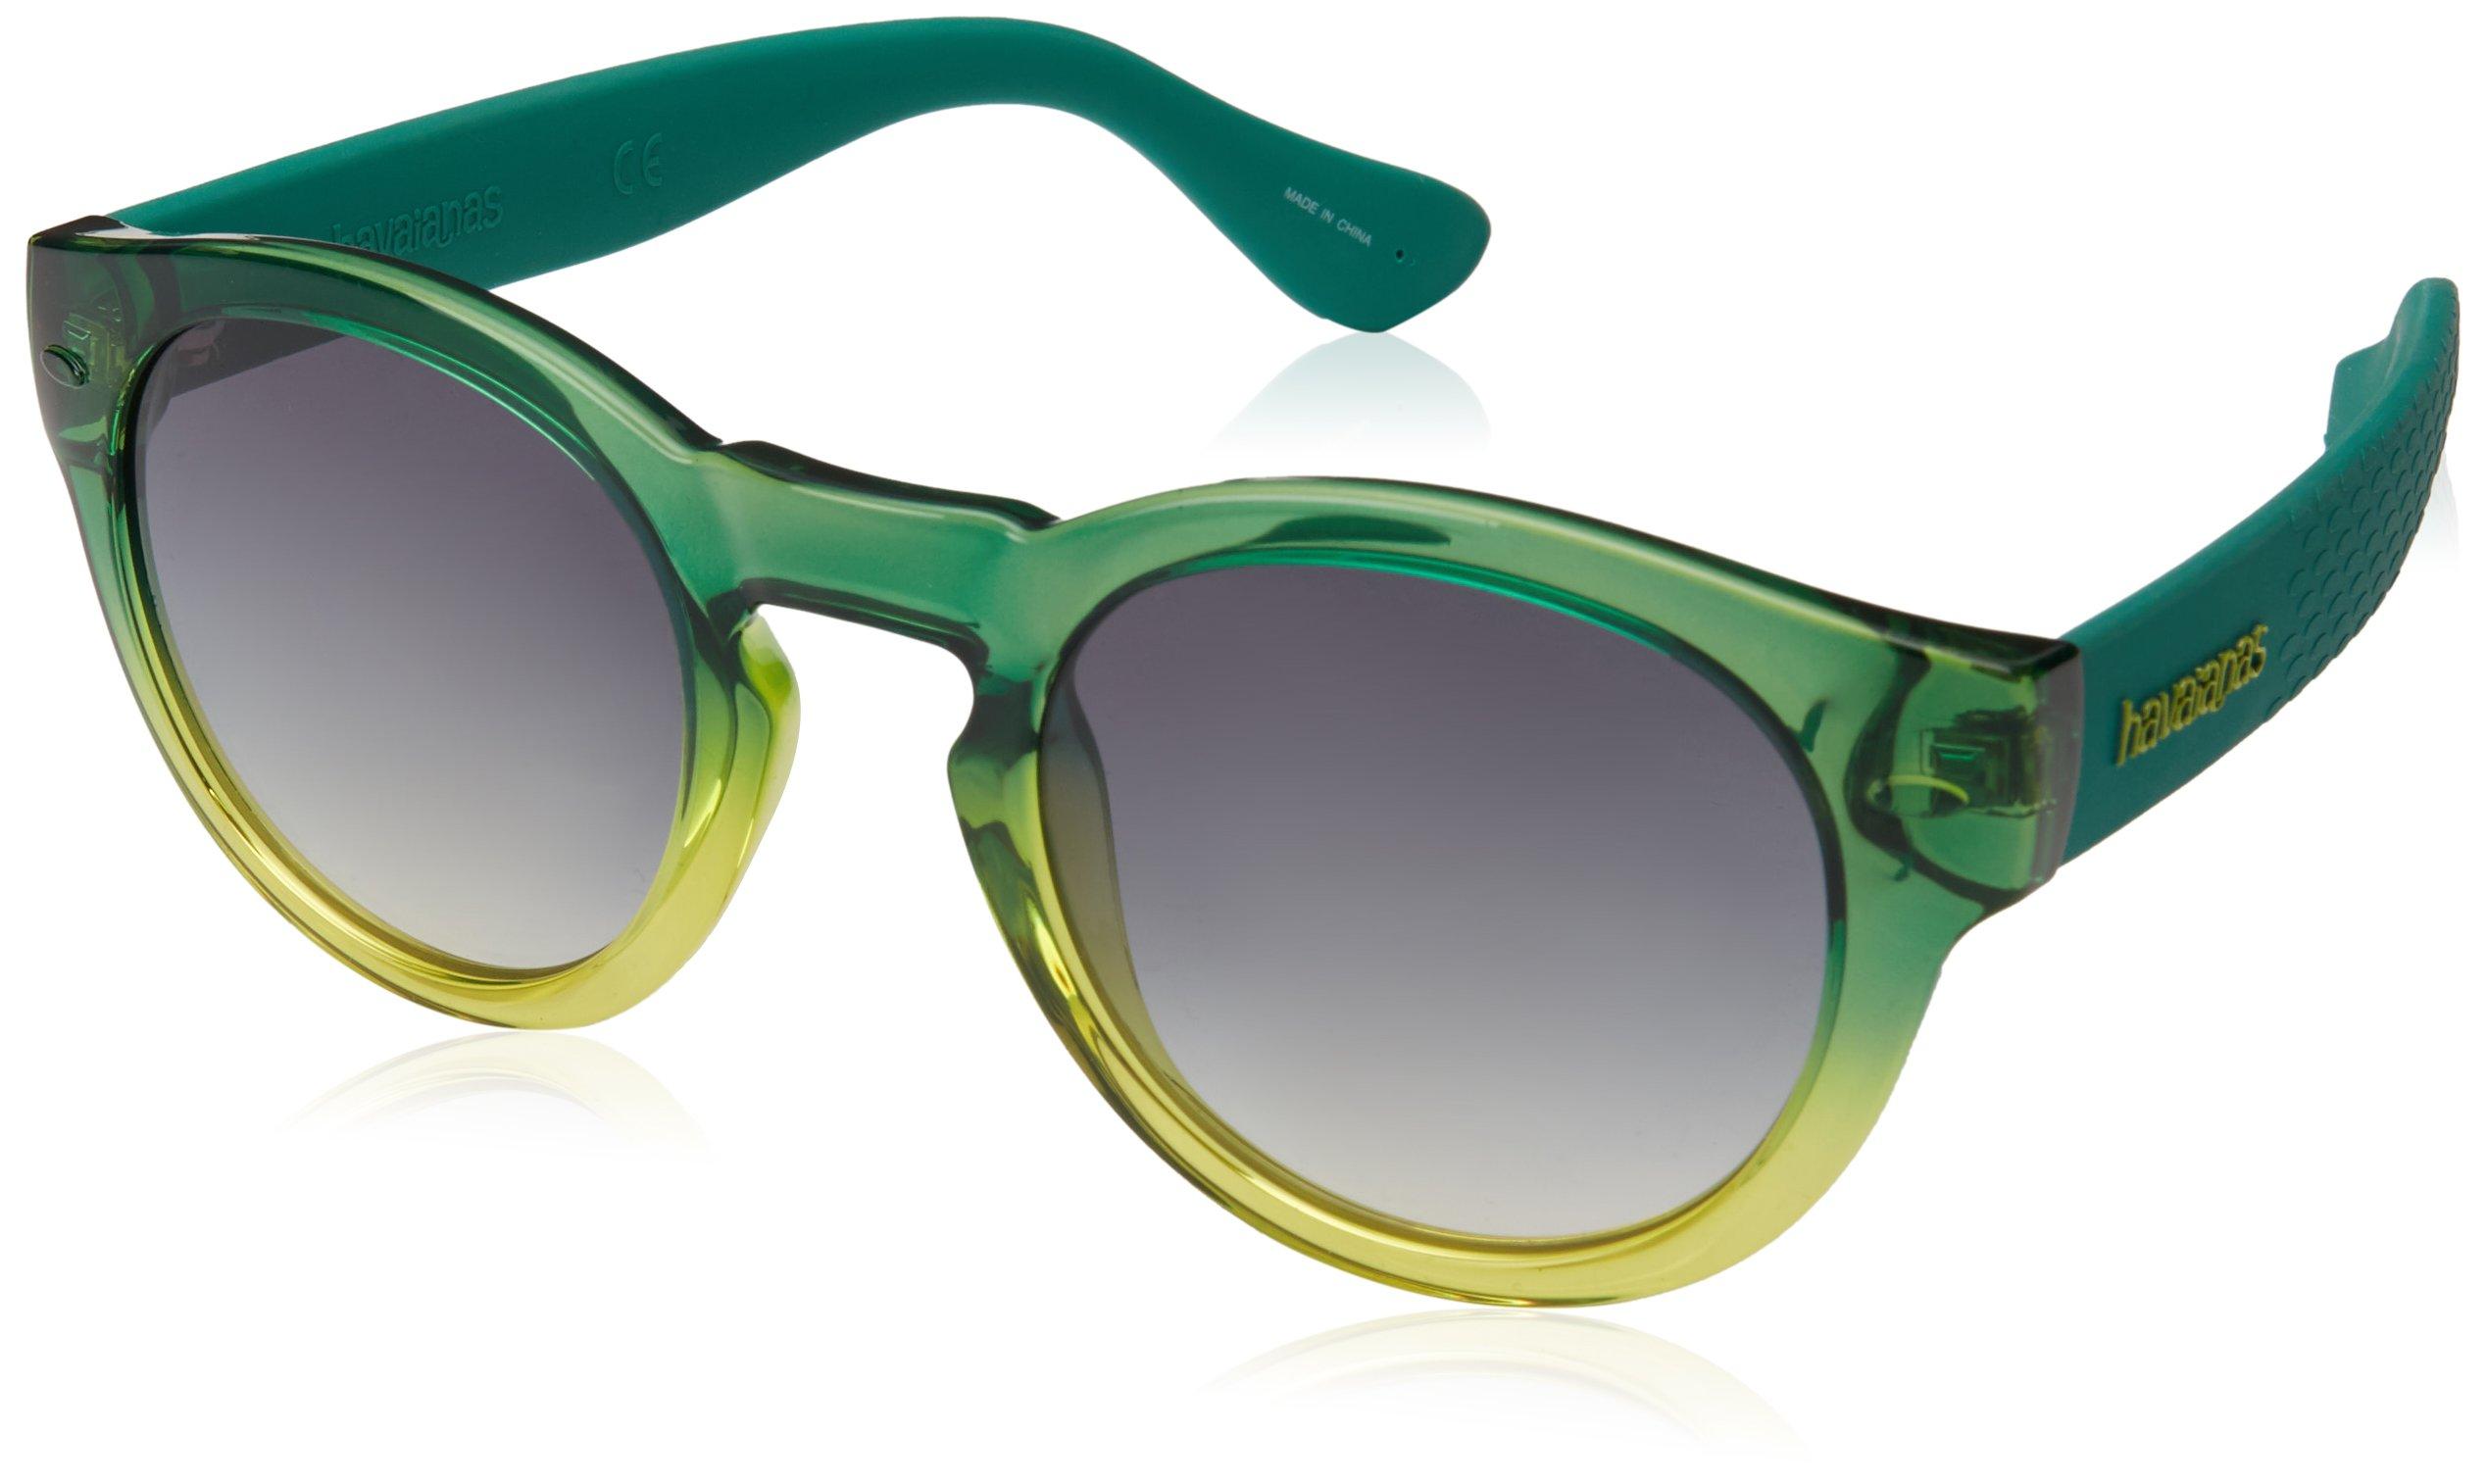 Sunglasses Mixte LunettesVertgreen Havaianas Montures De Adulte Trancoso Yellow49 kZlXwOPuTi